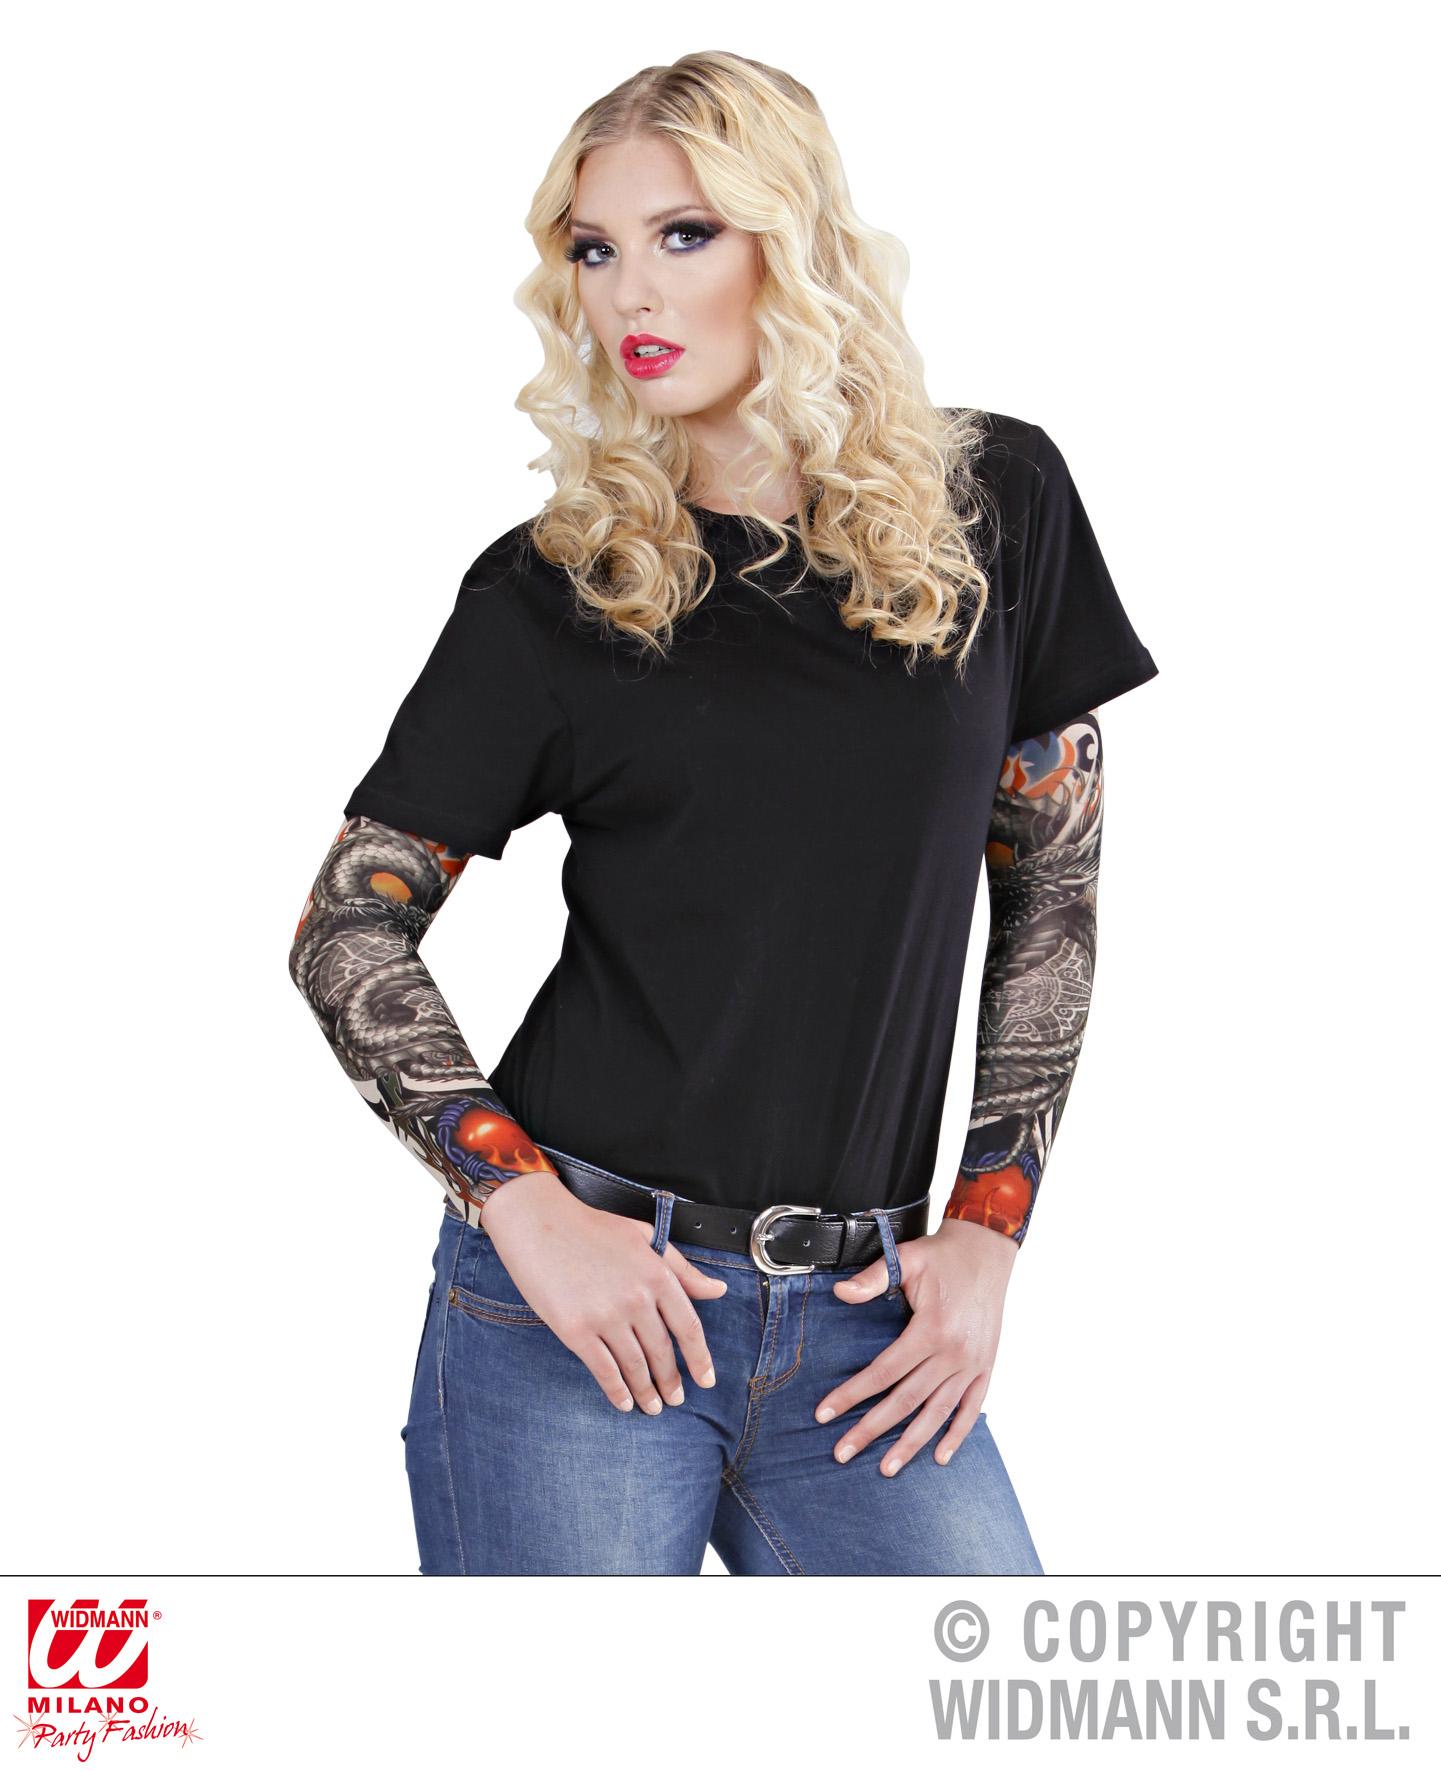 2x arm tattoo strumpf rmel schlange horro figur gag party 6869. Black Bedroom Furniture Sets. Home Design Ideas